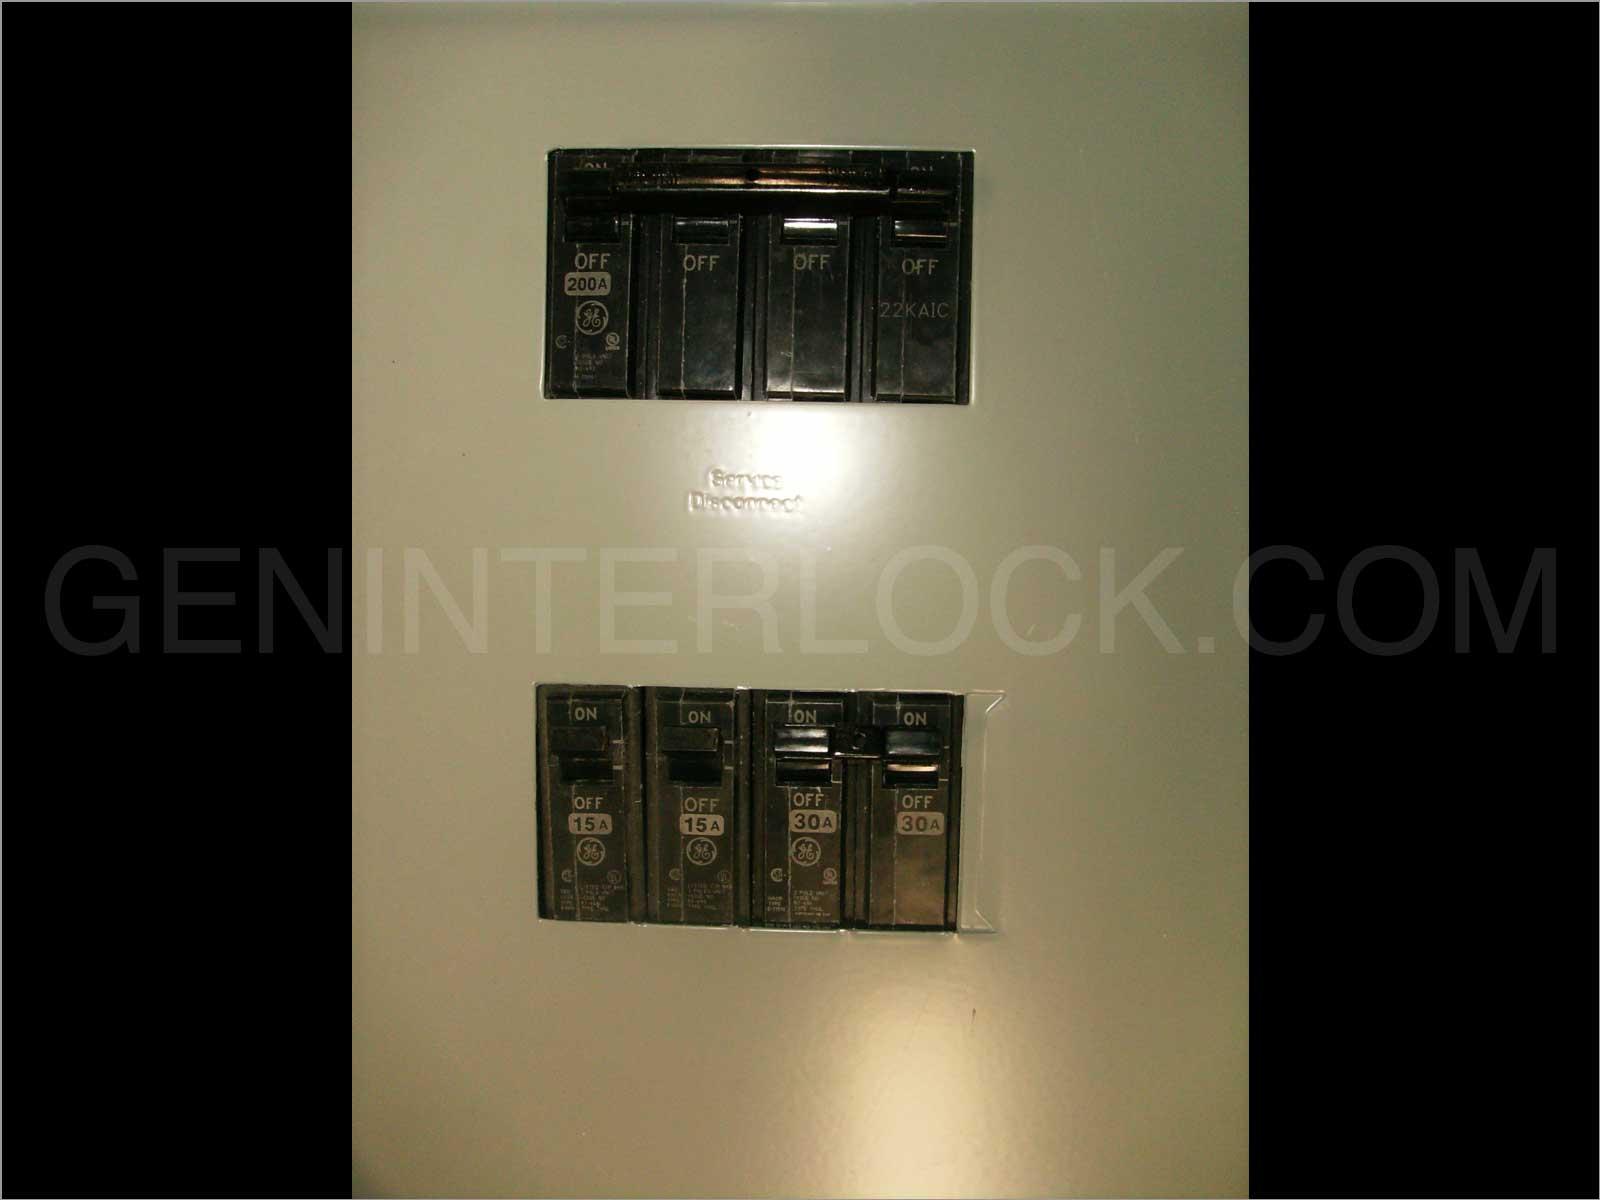 murray electric panels  | geninterlock.com